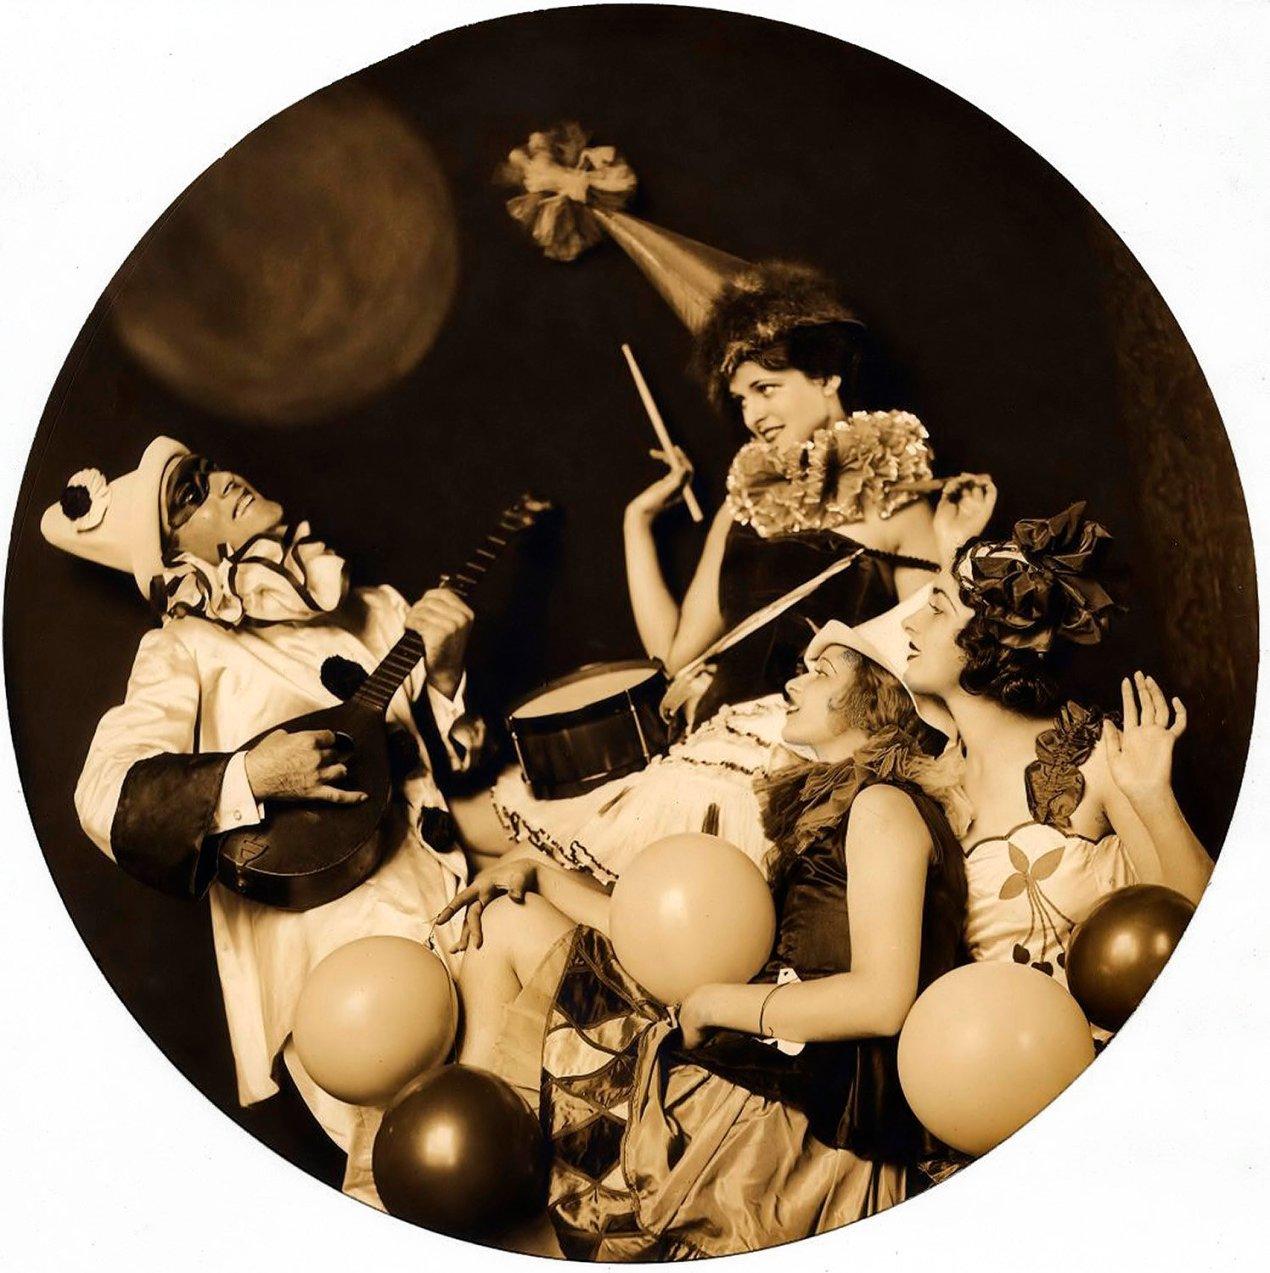 Ziegfeld Model - Non-Risque - by Alfred Cheney Johnston - Pierrot Serenading Three Women